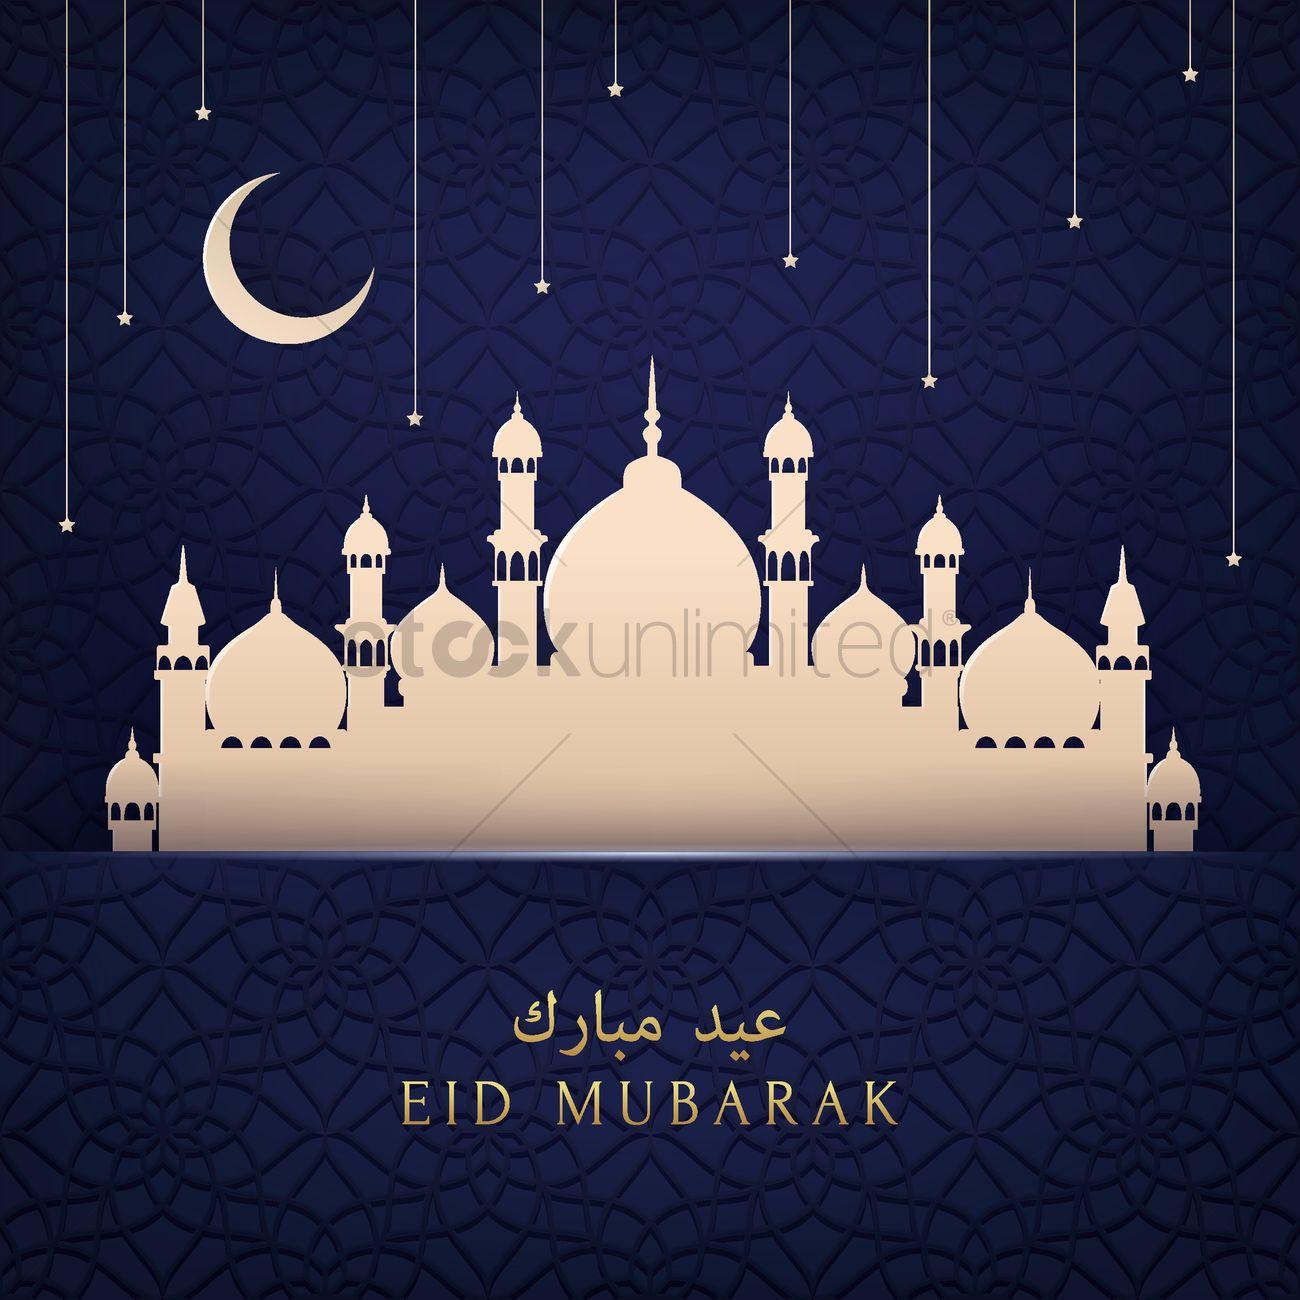 Eid Mubarak Greeting Vector Image 1828212 Stockunlimited